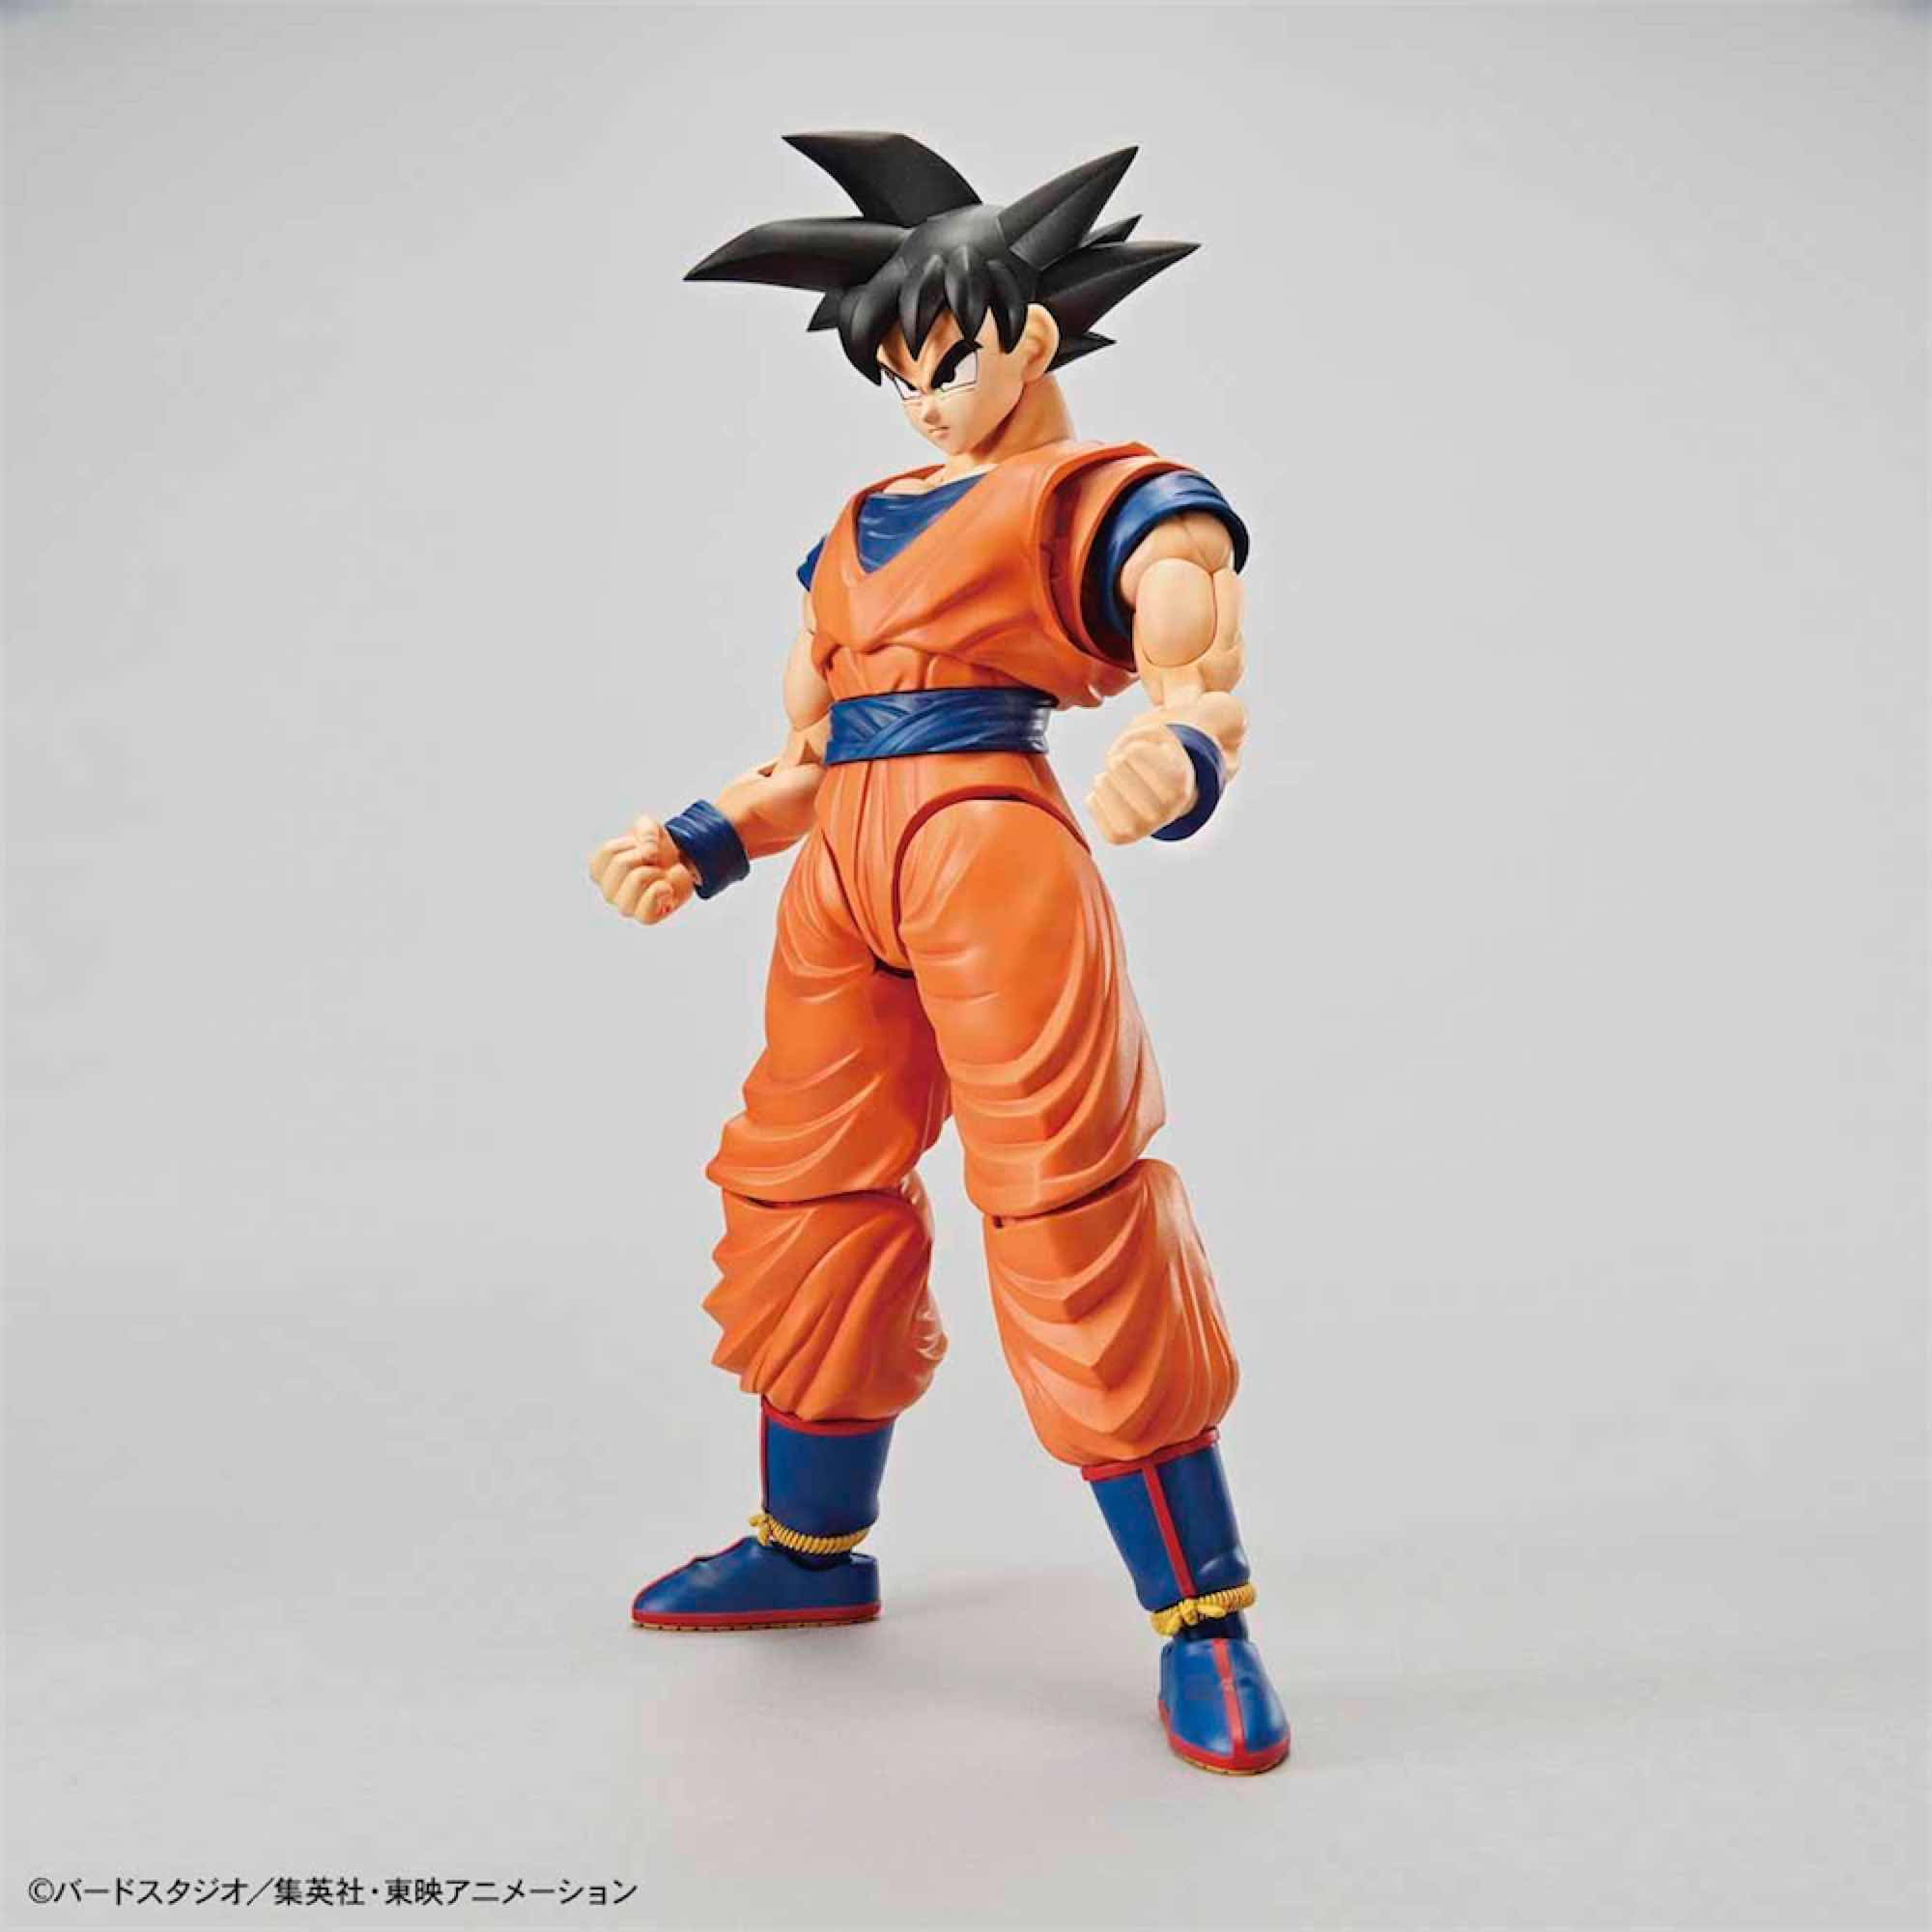 SON GOKU MODEL KIT FIGURA 16 CM DRAGON BALL Z FIGURE-RISE STANDARD 83856P